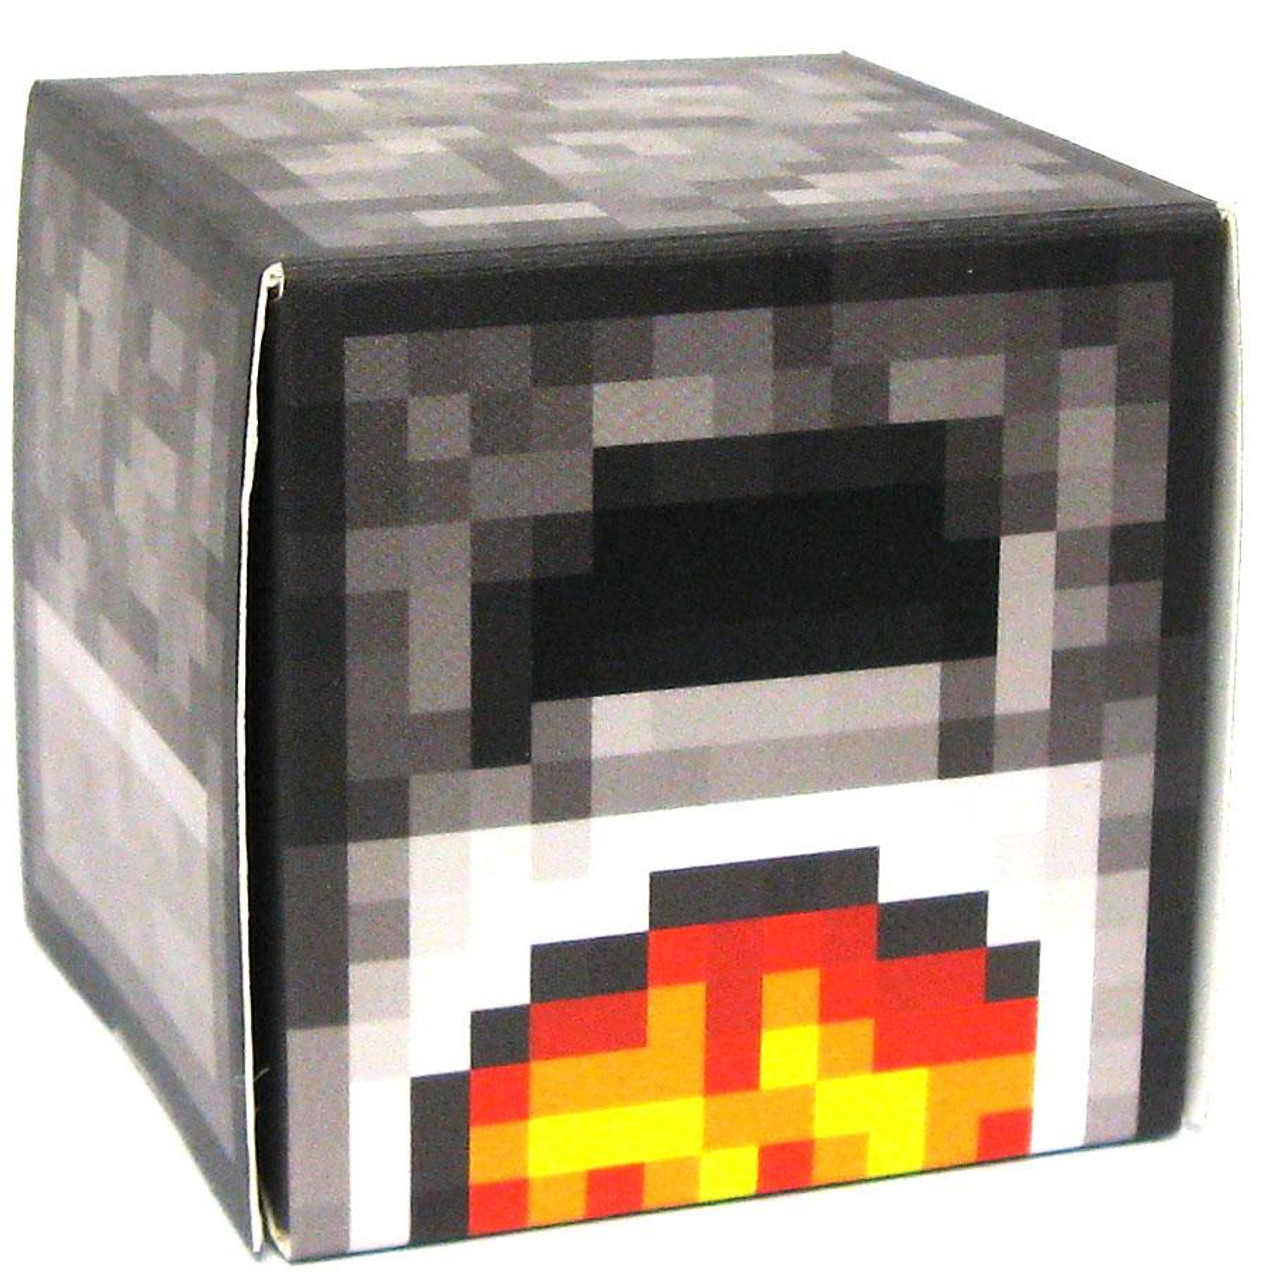 Minecraft Lit Furnace Papercraft [Single Piece]